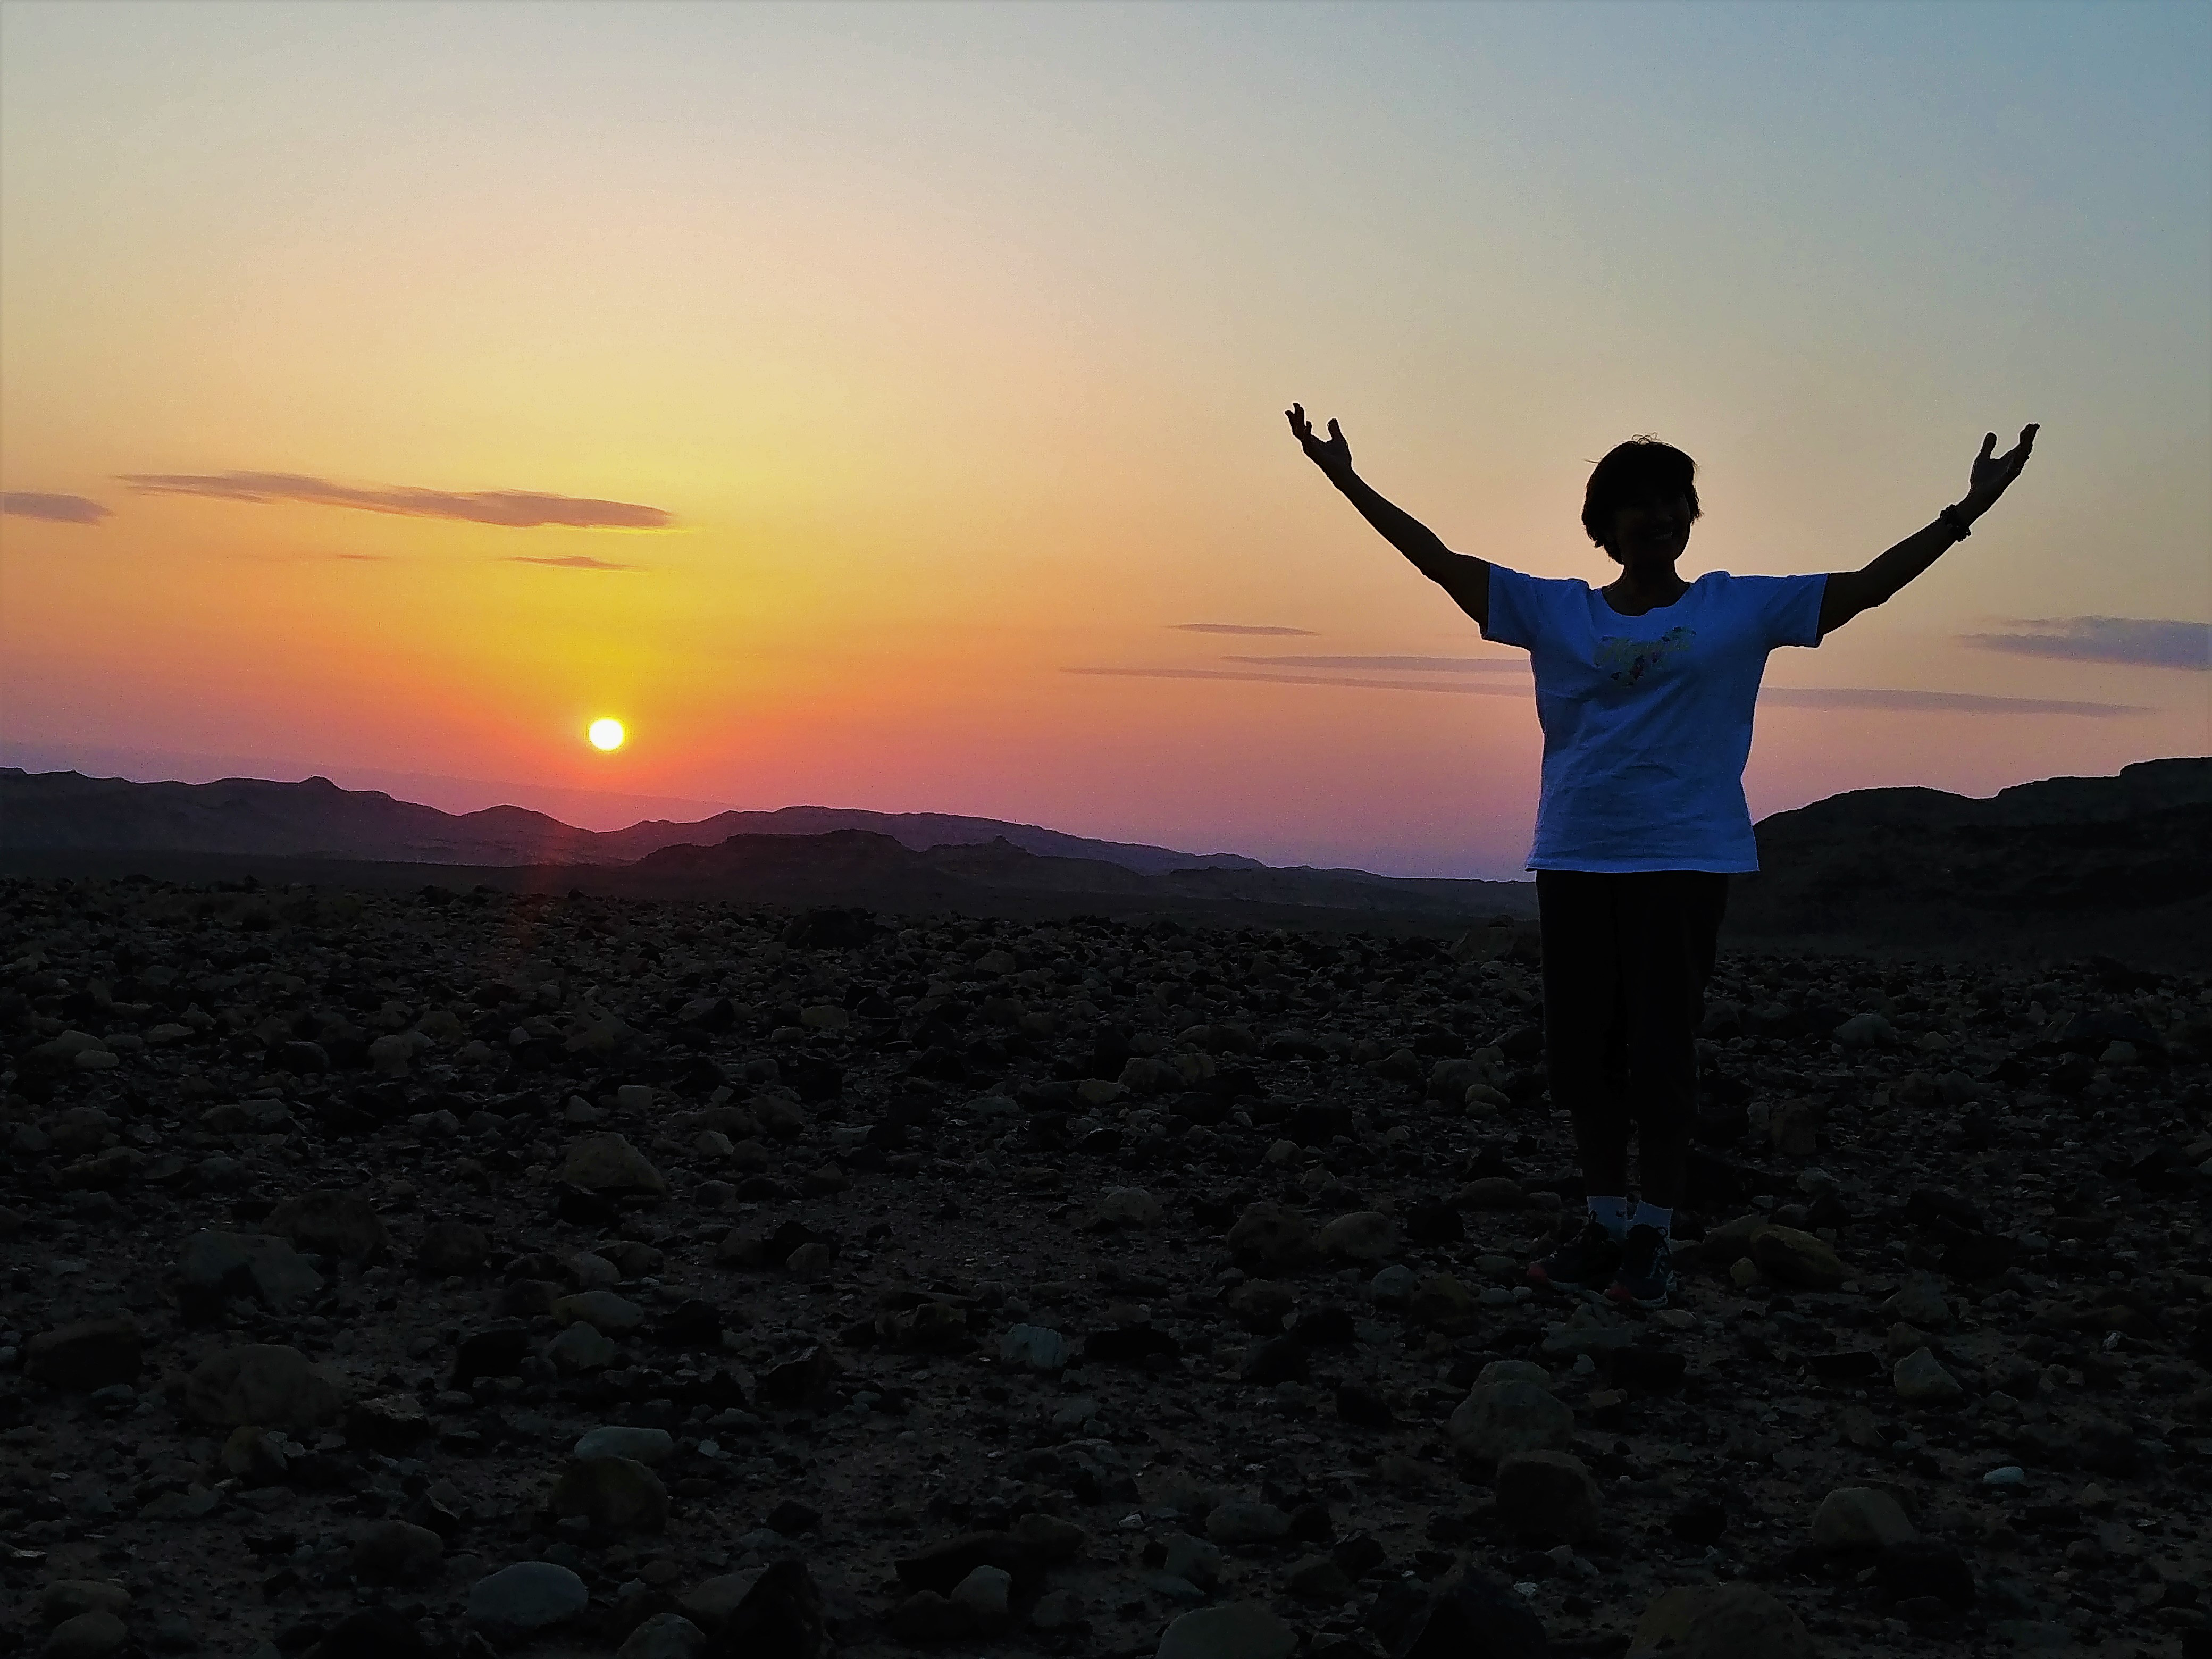 Sunset at Dana Biosphere .